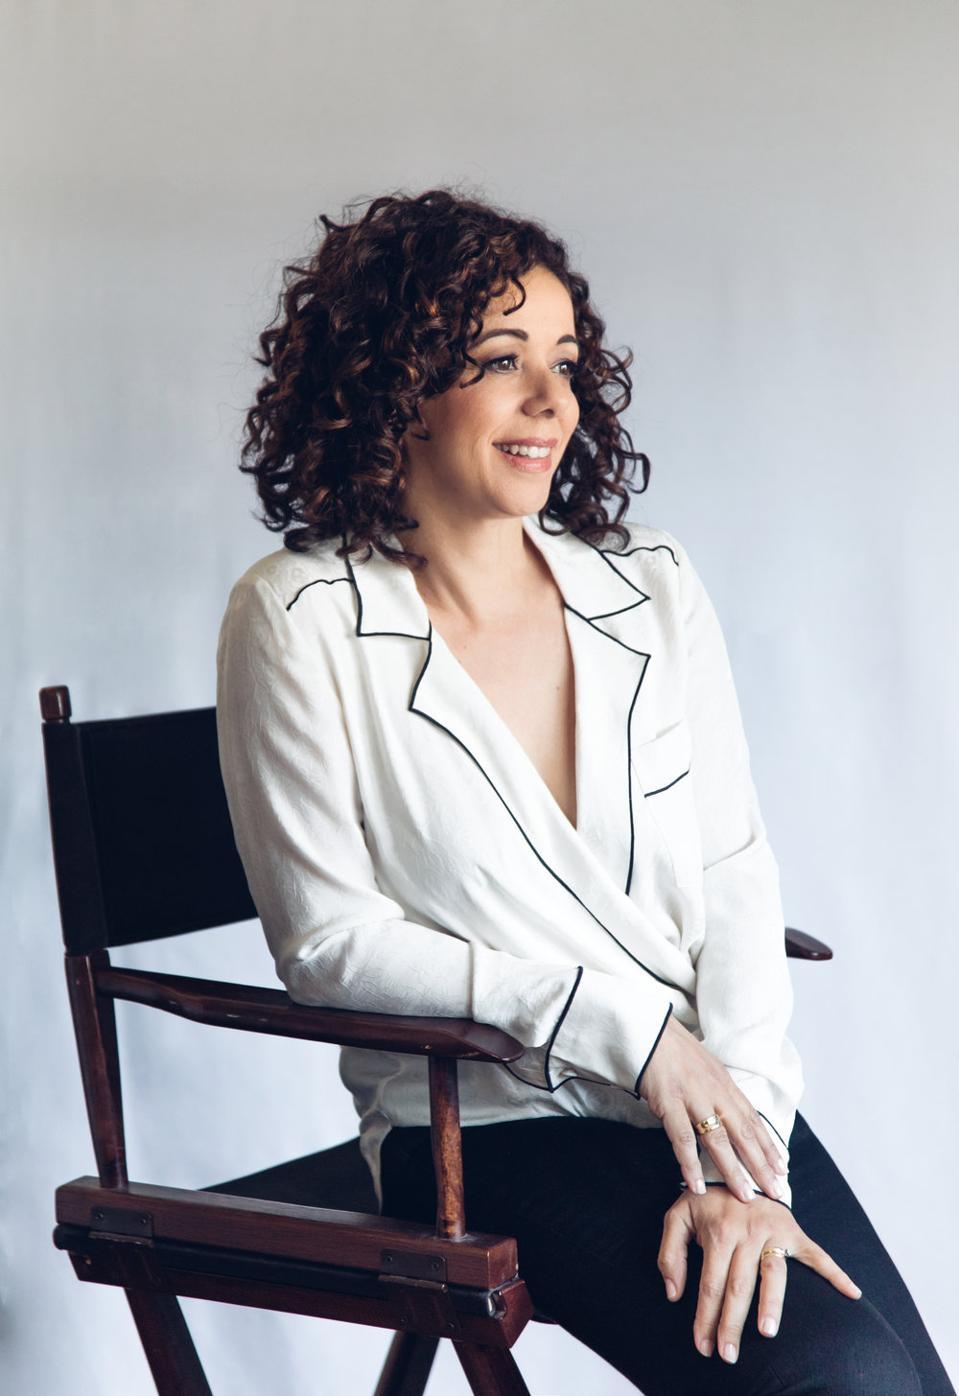 Grammy-winning vocalist Luciana Souza sitting in a chair